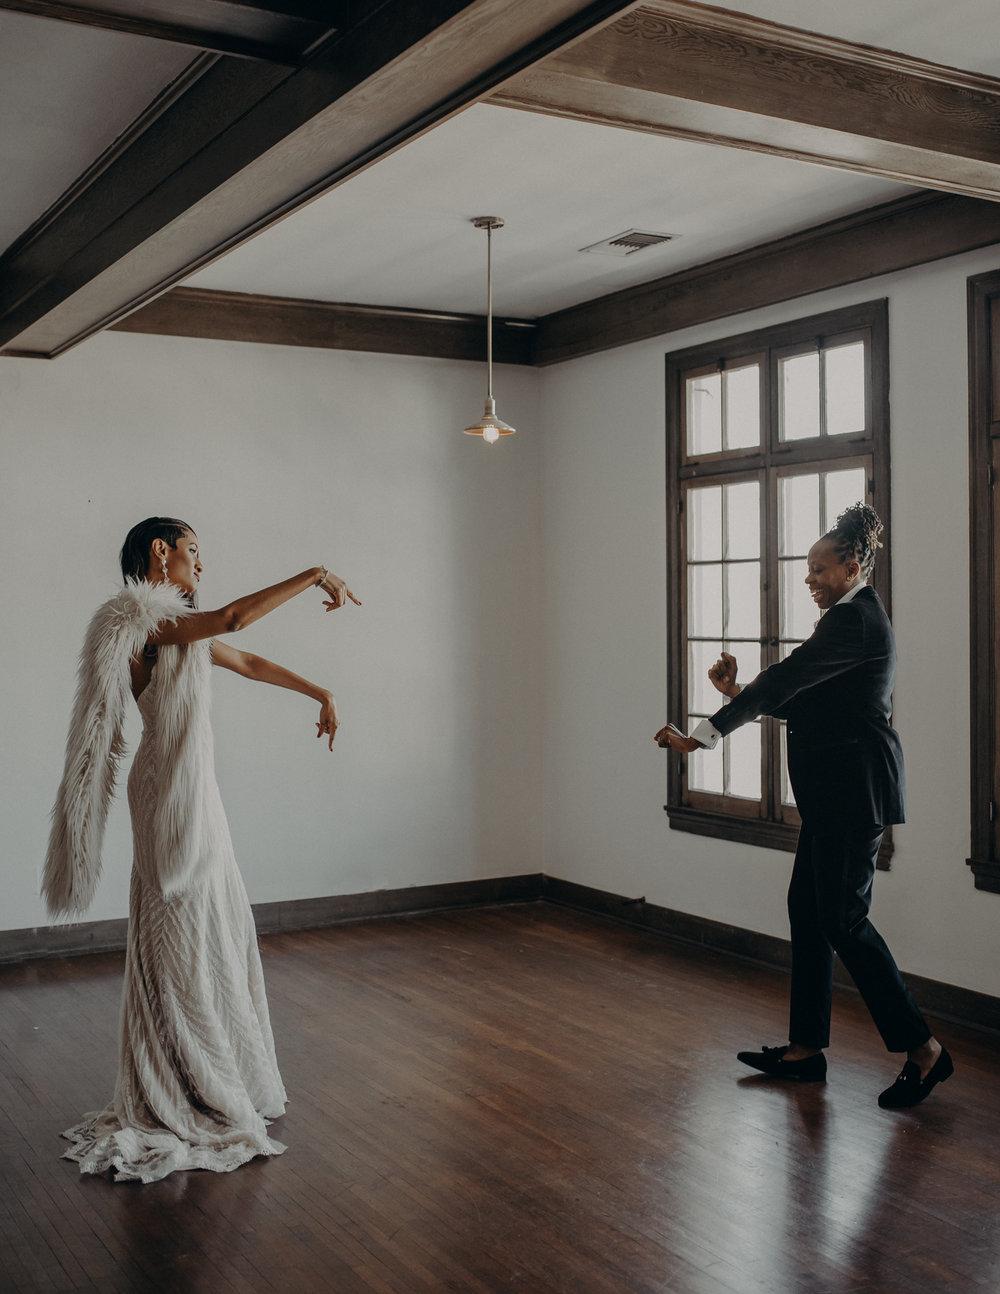 Wedding Photographer in Los Angeles - Ebell of Long Beach Wedding - LGBTQ weddings - lesbian wedding - IsaiahAndTaylor.com-042.jpg